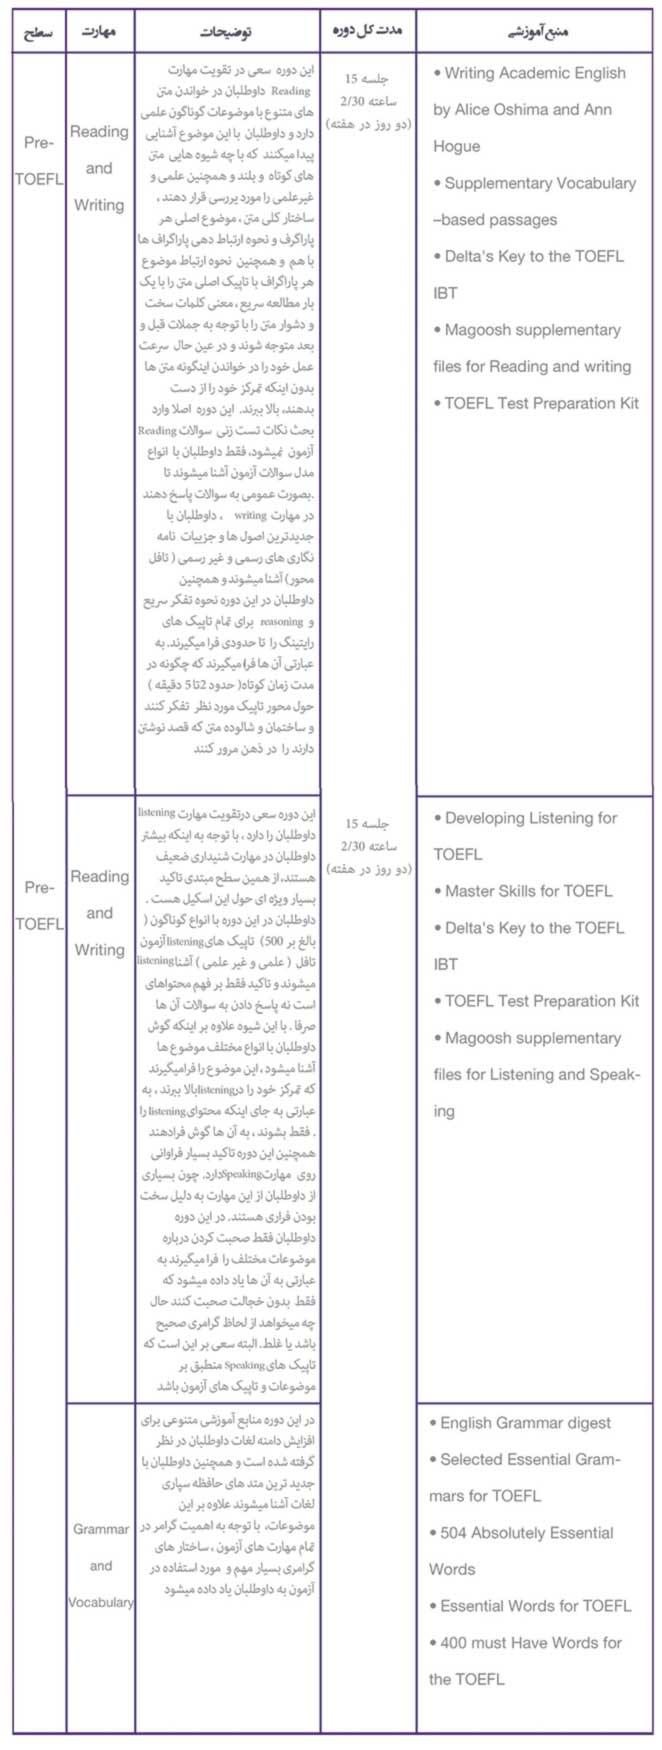 دوره Pre-TOEFL,Pre-TOEFL,TOEFL,Intermediate,Vocabulary